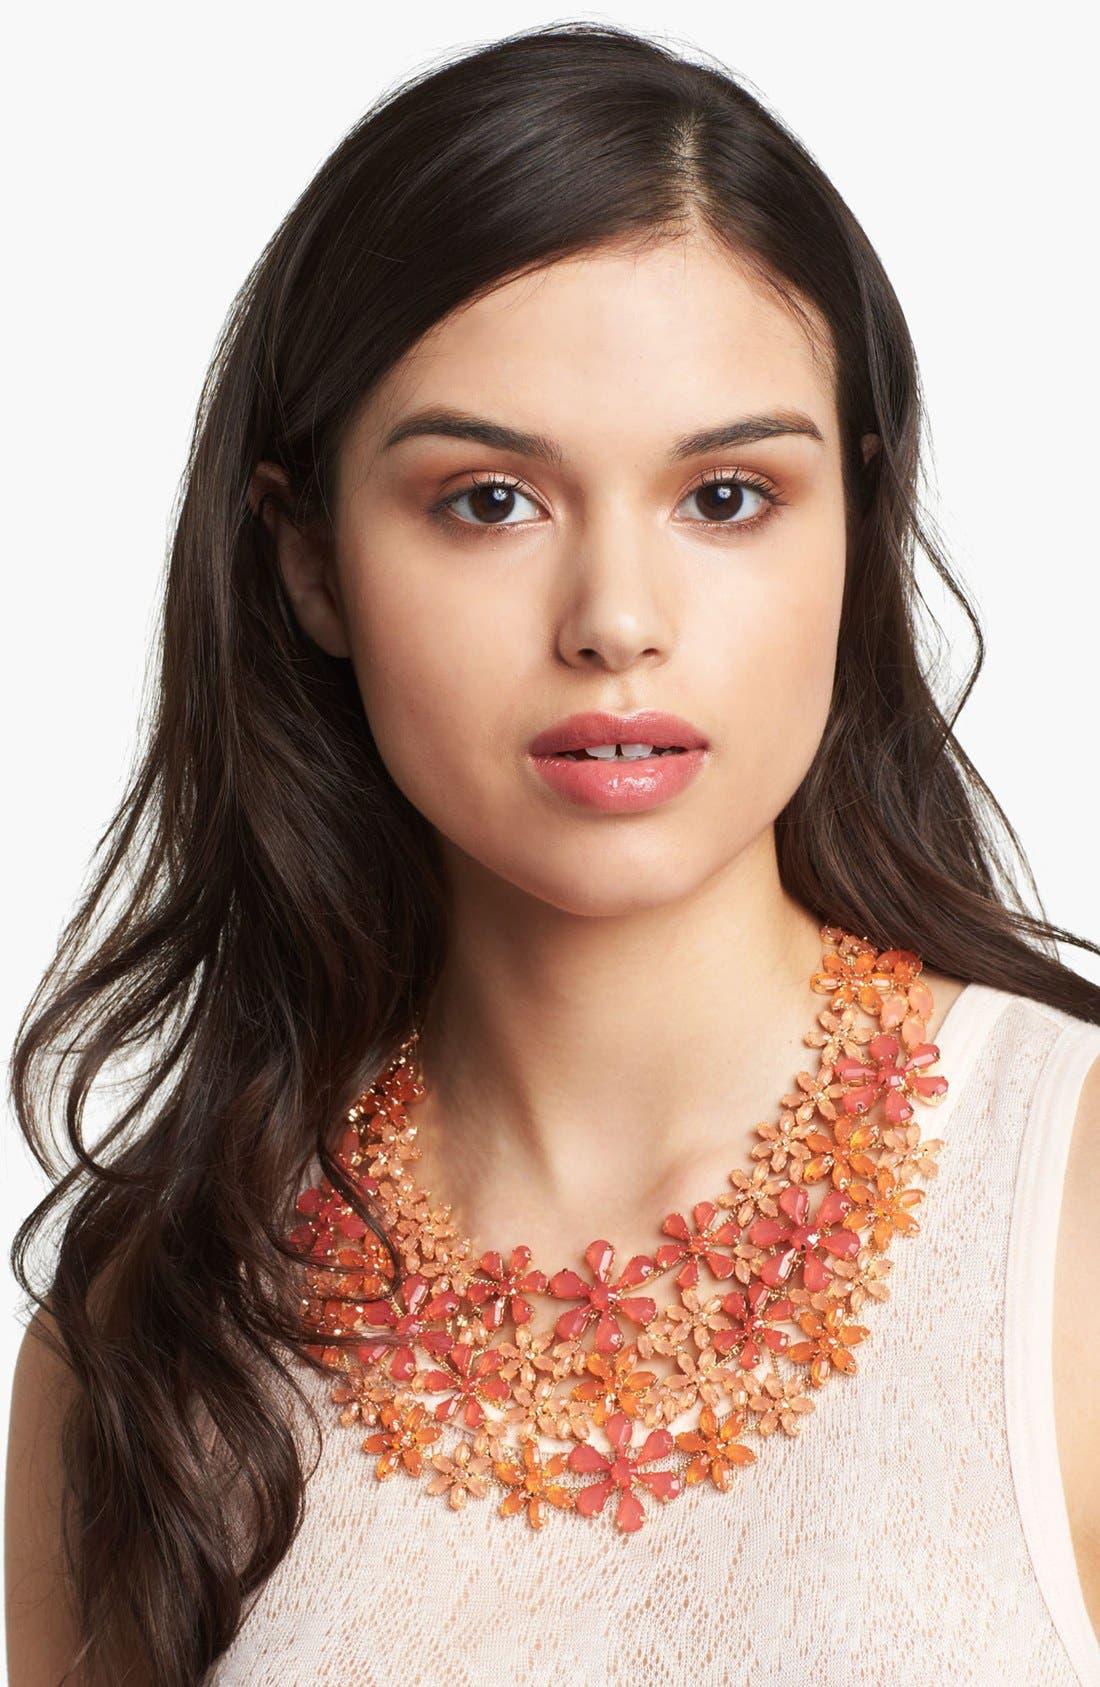 Alternate Image 1 Selected - Tasha 'Field of Flowers' Bib Necklace